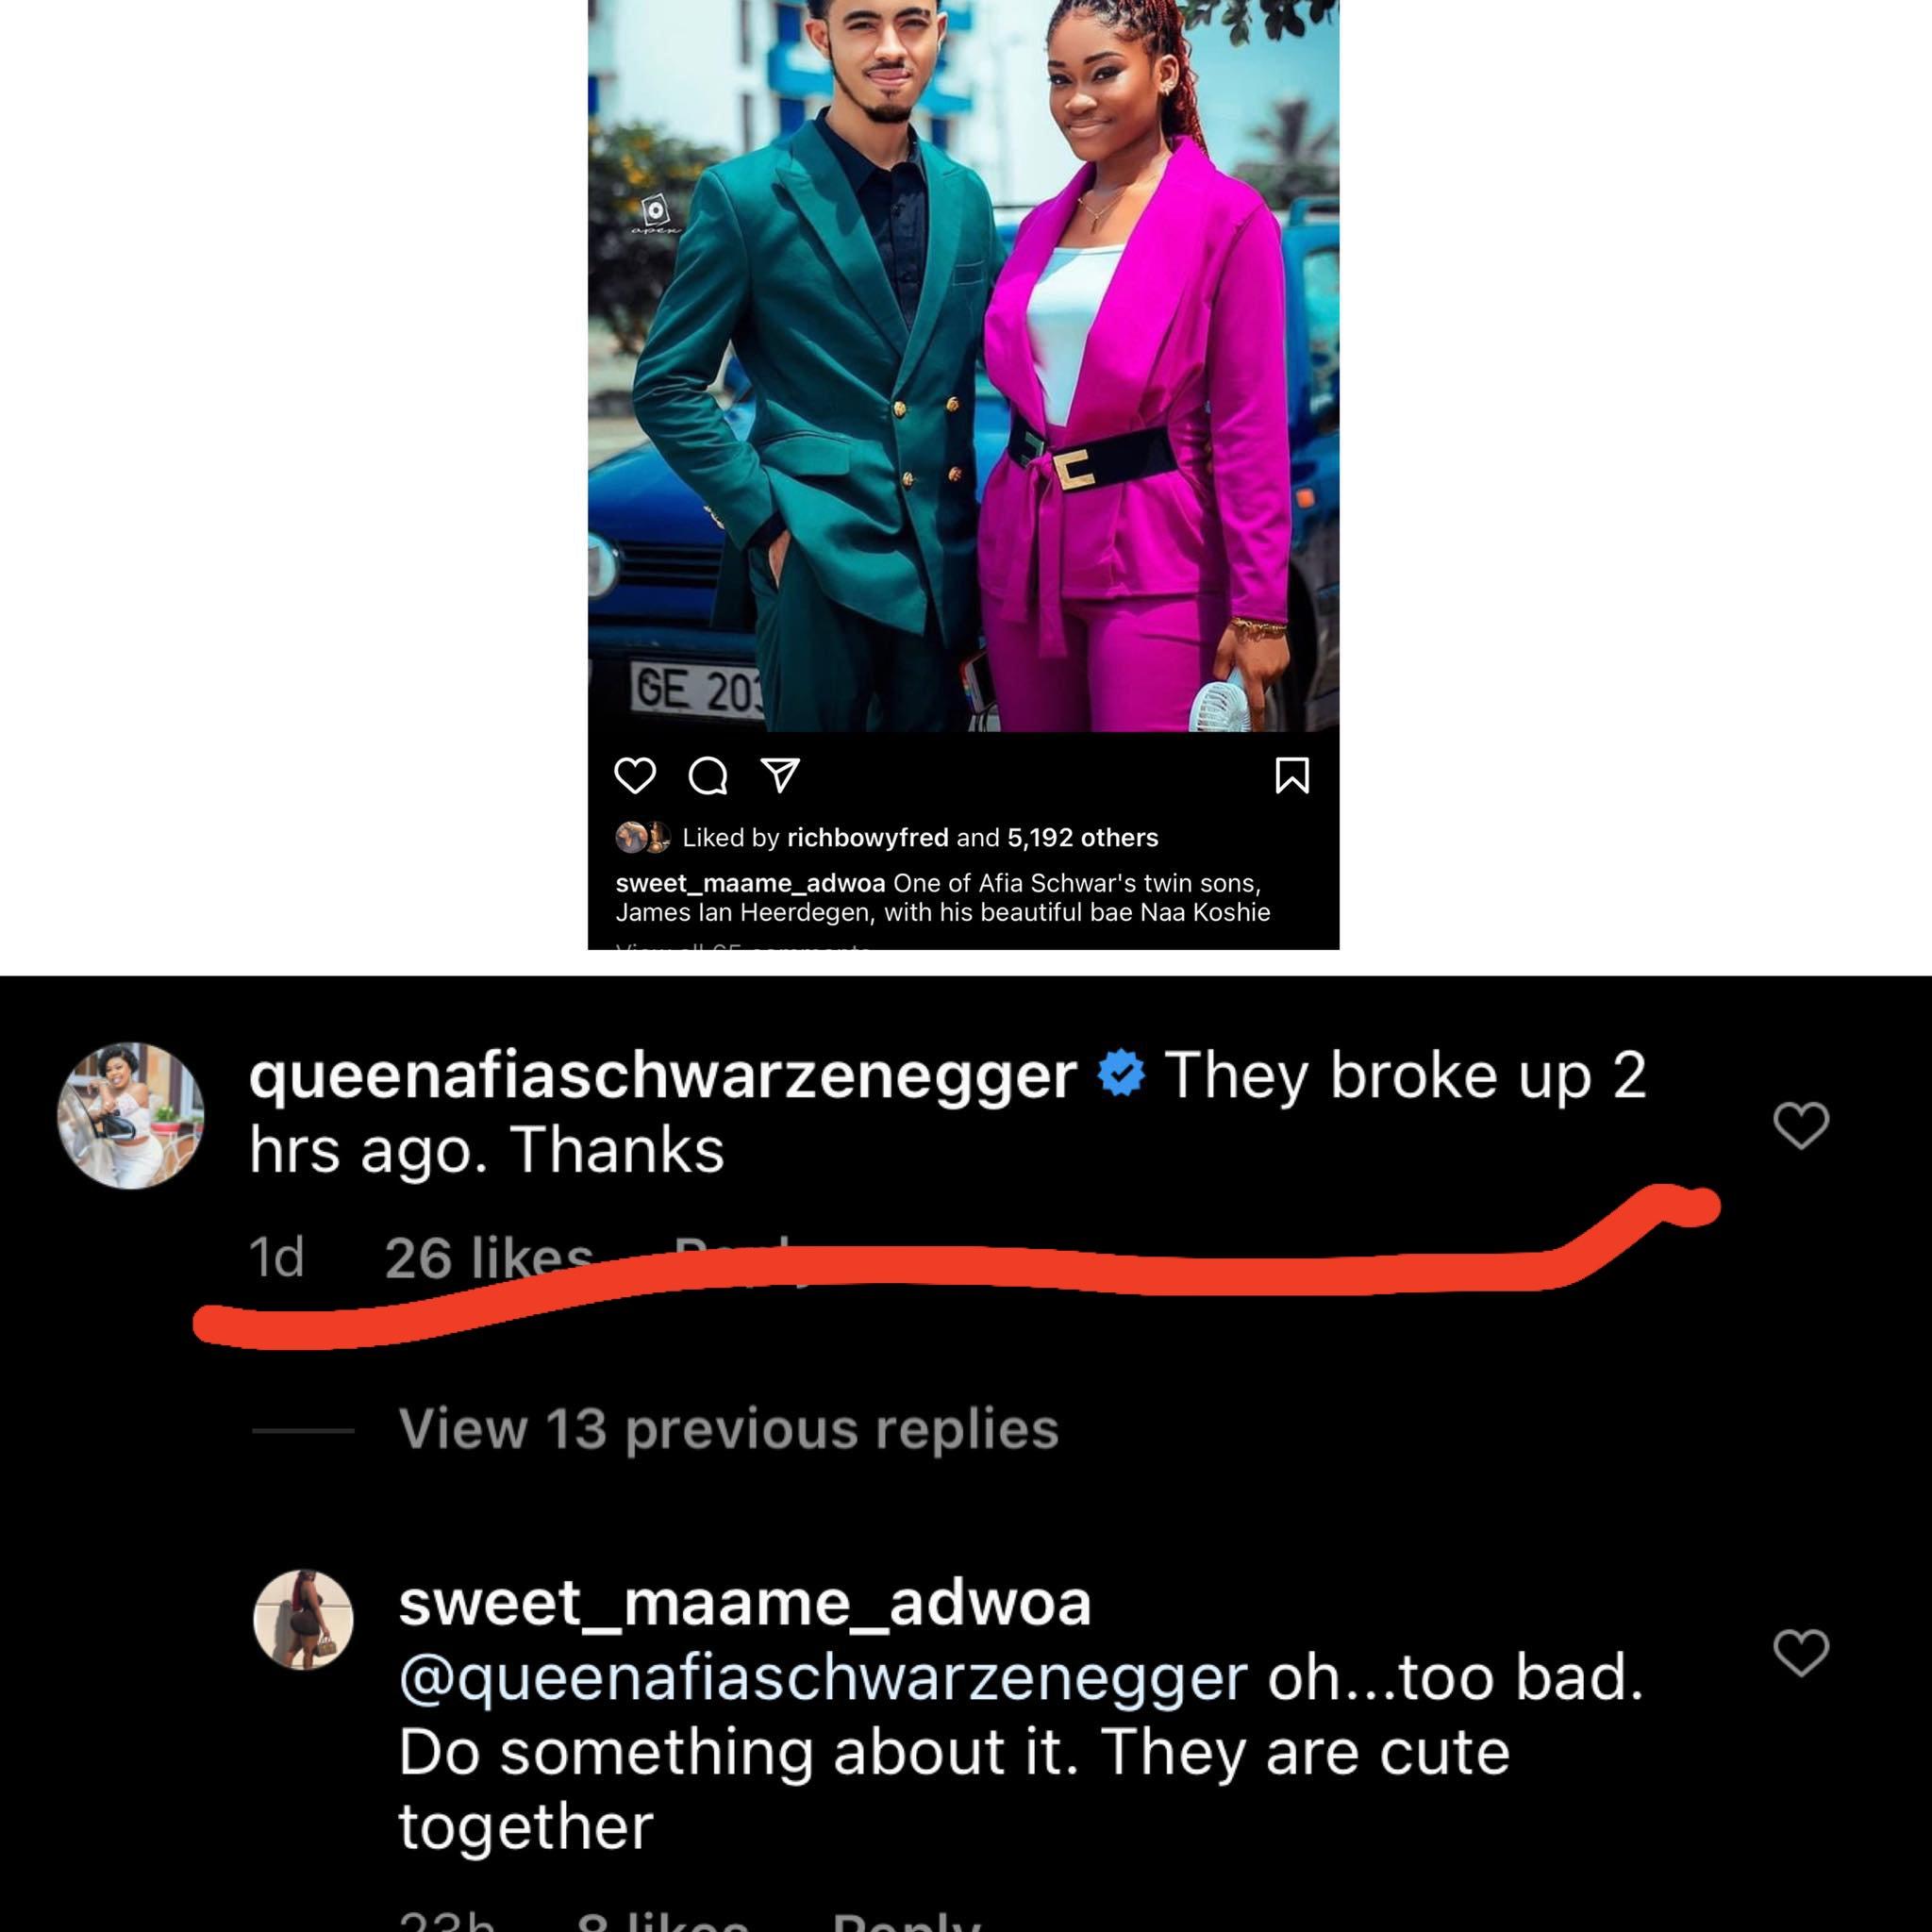 james%2Band%2Bgirlfriend - Afia Schwar' twin son James Ian Geiling Heerdegan breaks up with girlfriend after their bedroom photo leaked online